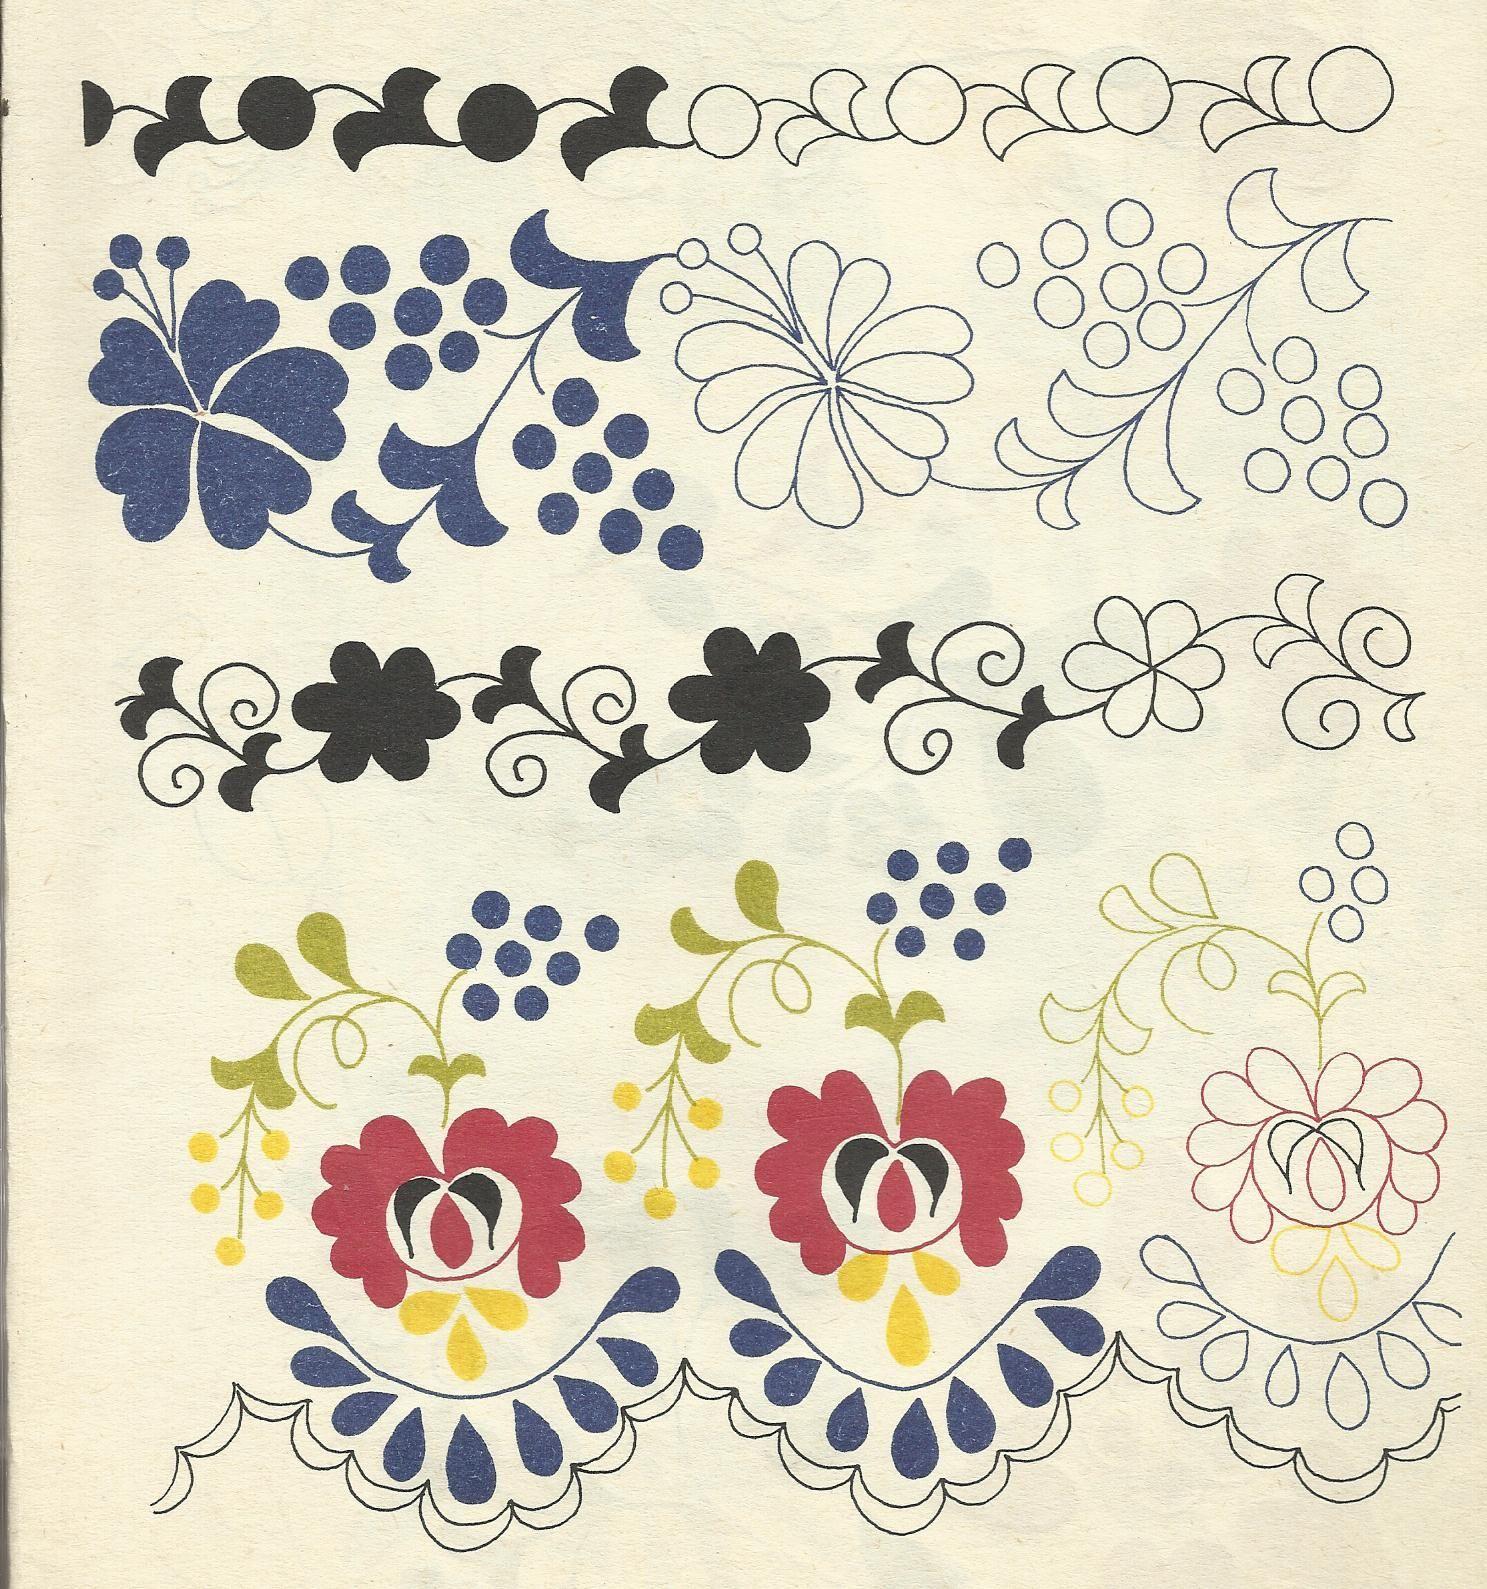 korai_kalocsai_himzesek_12_1540278_6781.jpg (1487×1589) | Embroidery ...